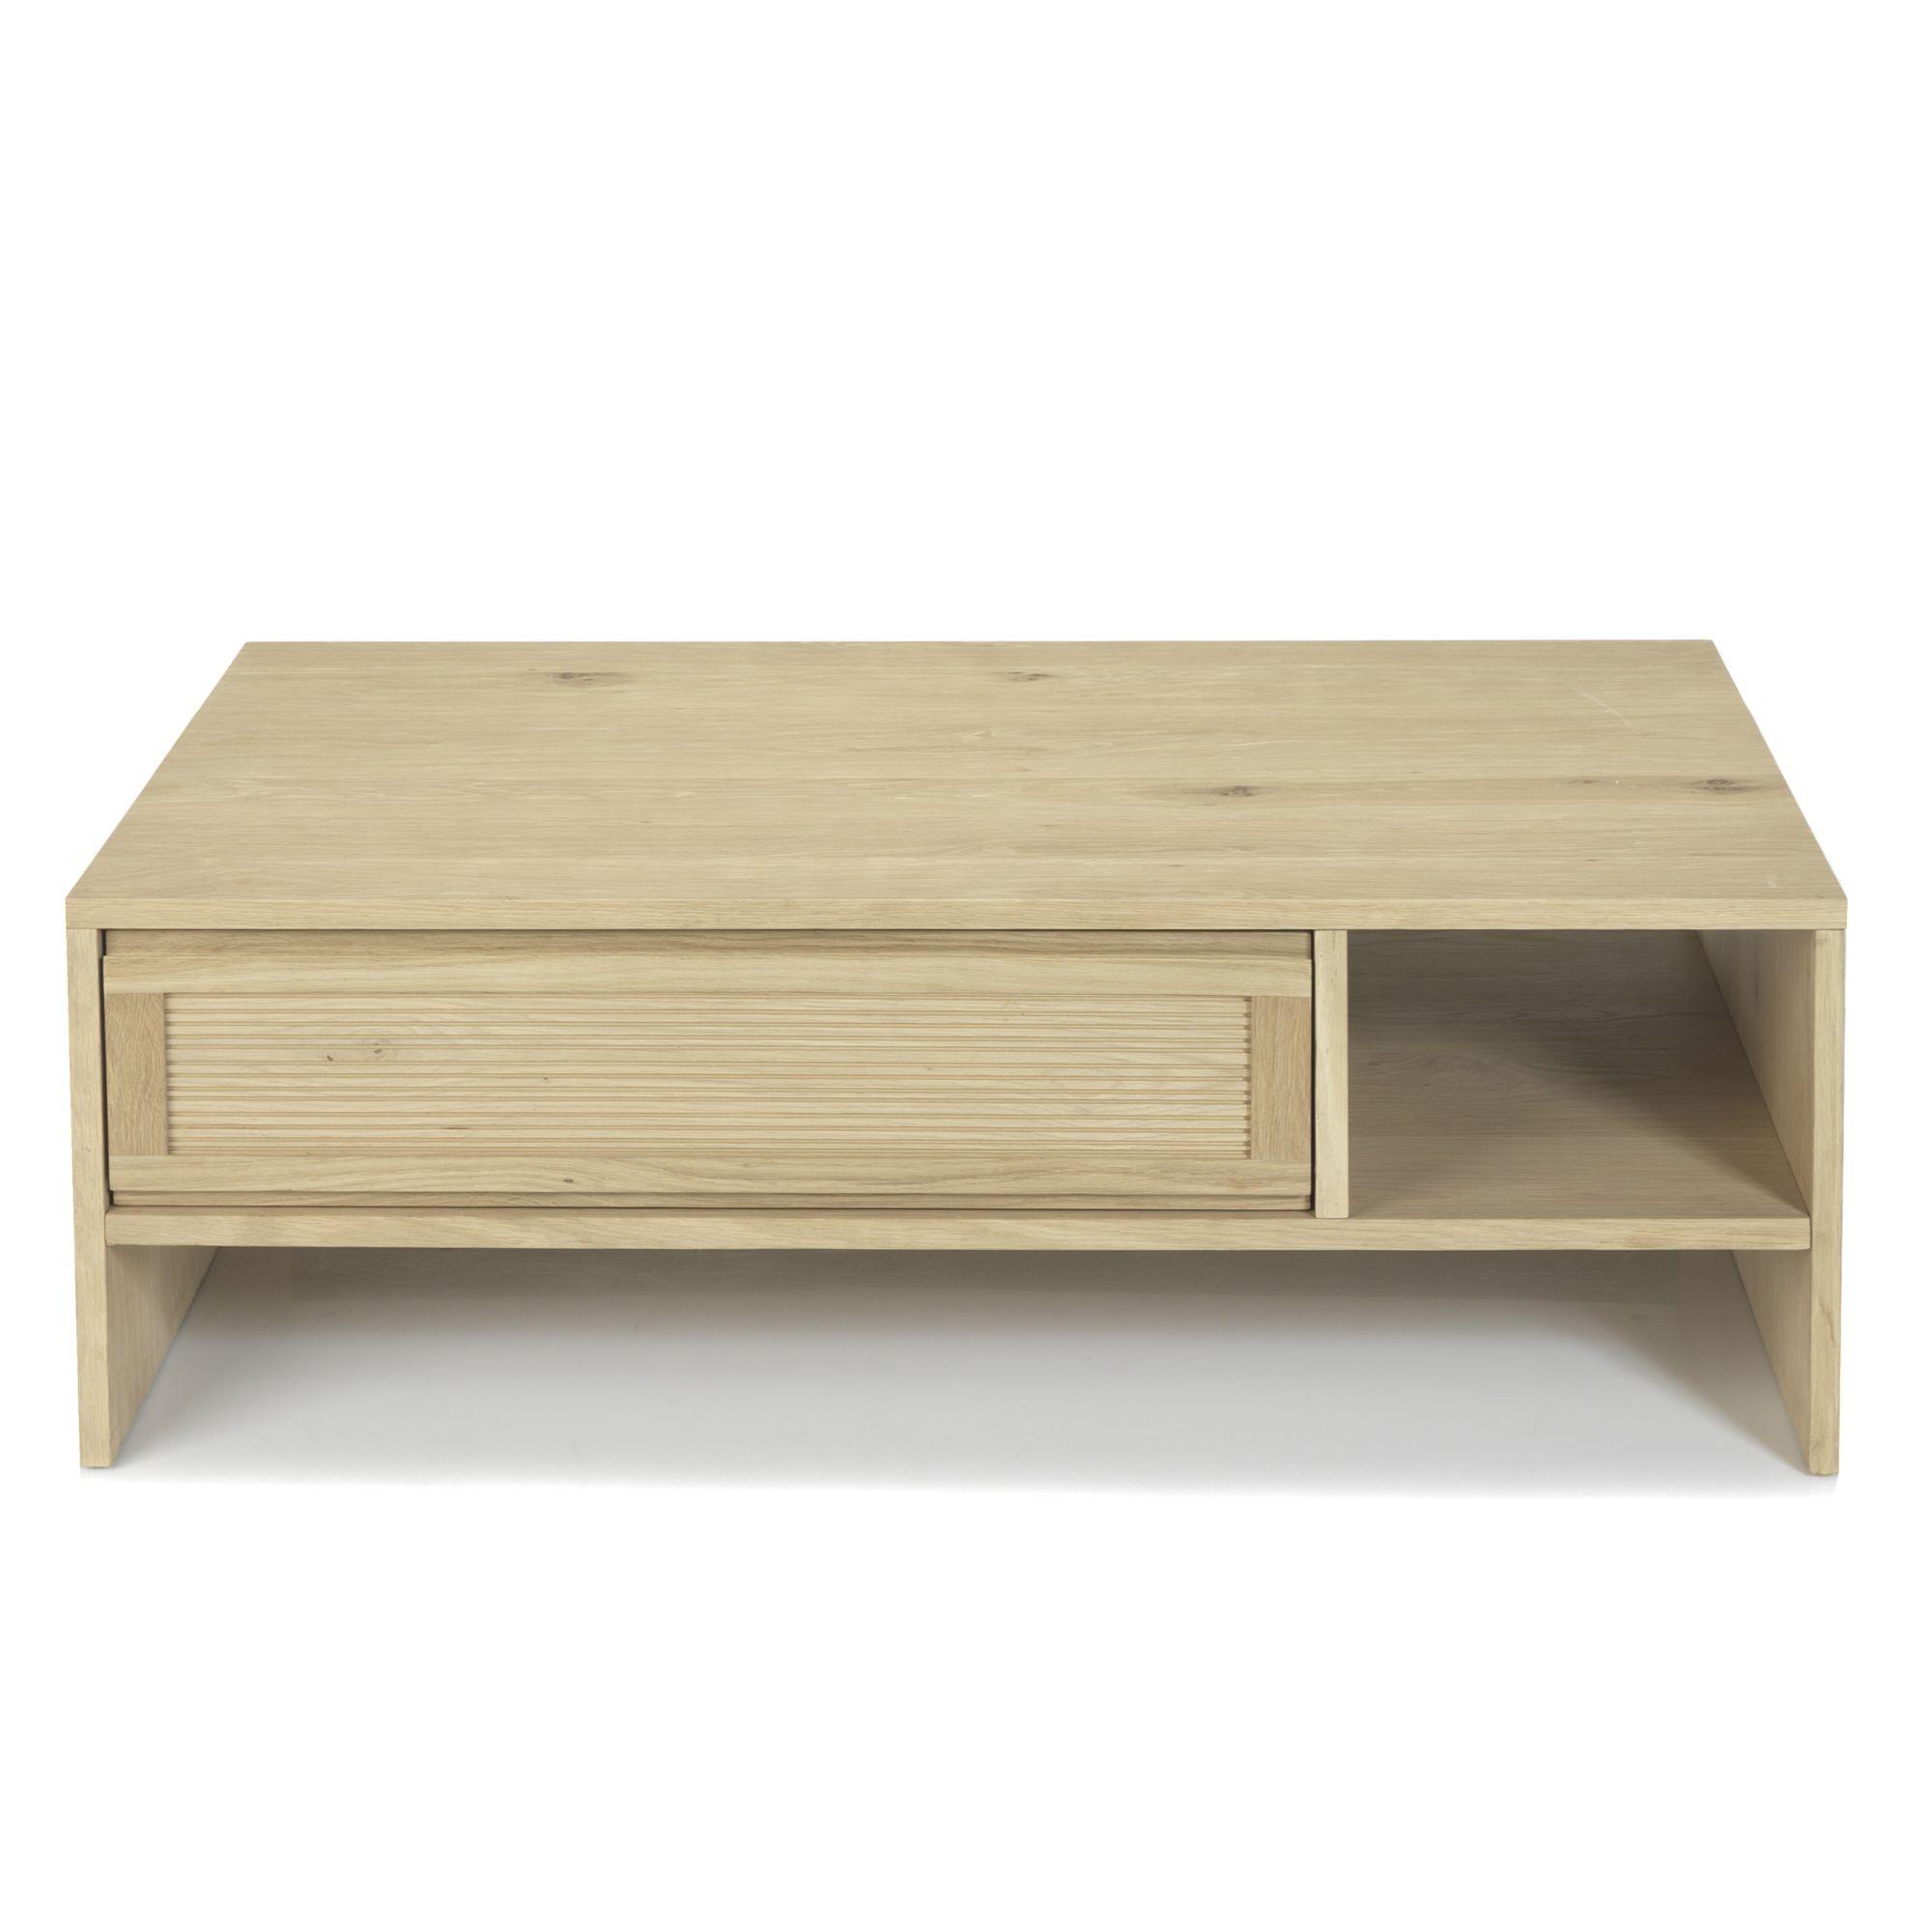 d36c6605d7ff75b710143d78d3a6739e Luxe De Mini Table Basse Concept